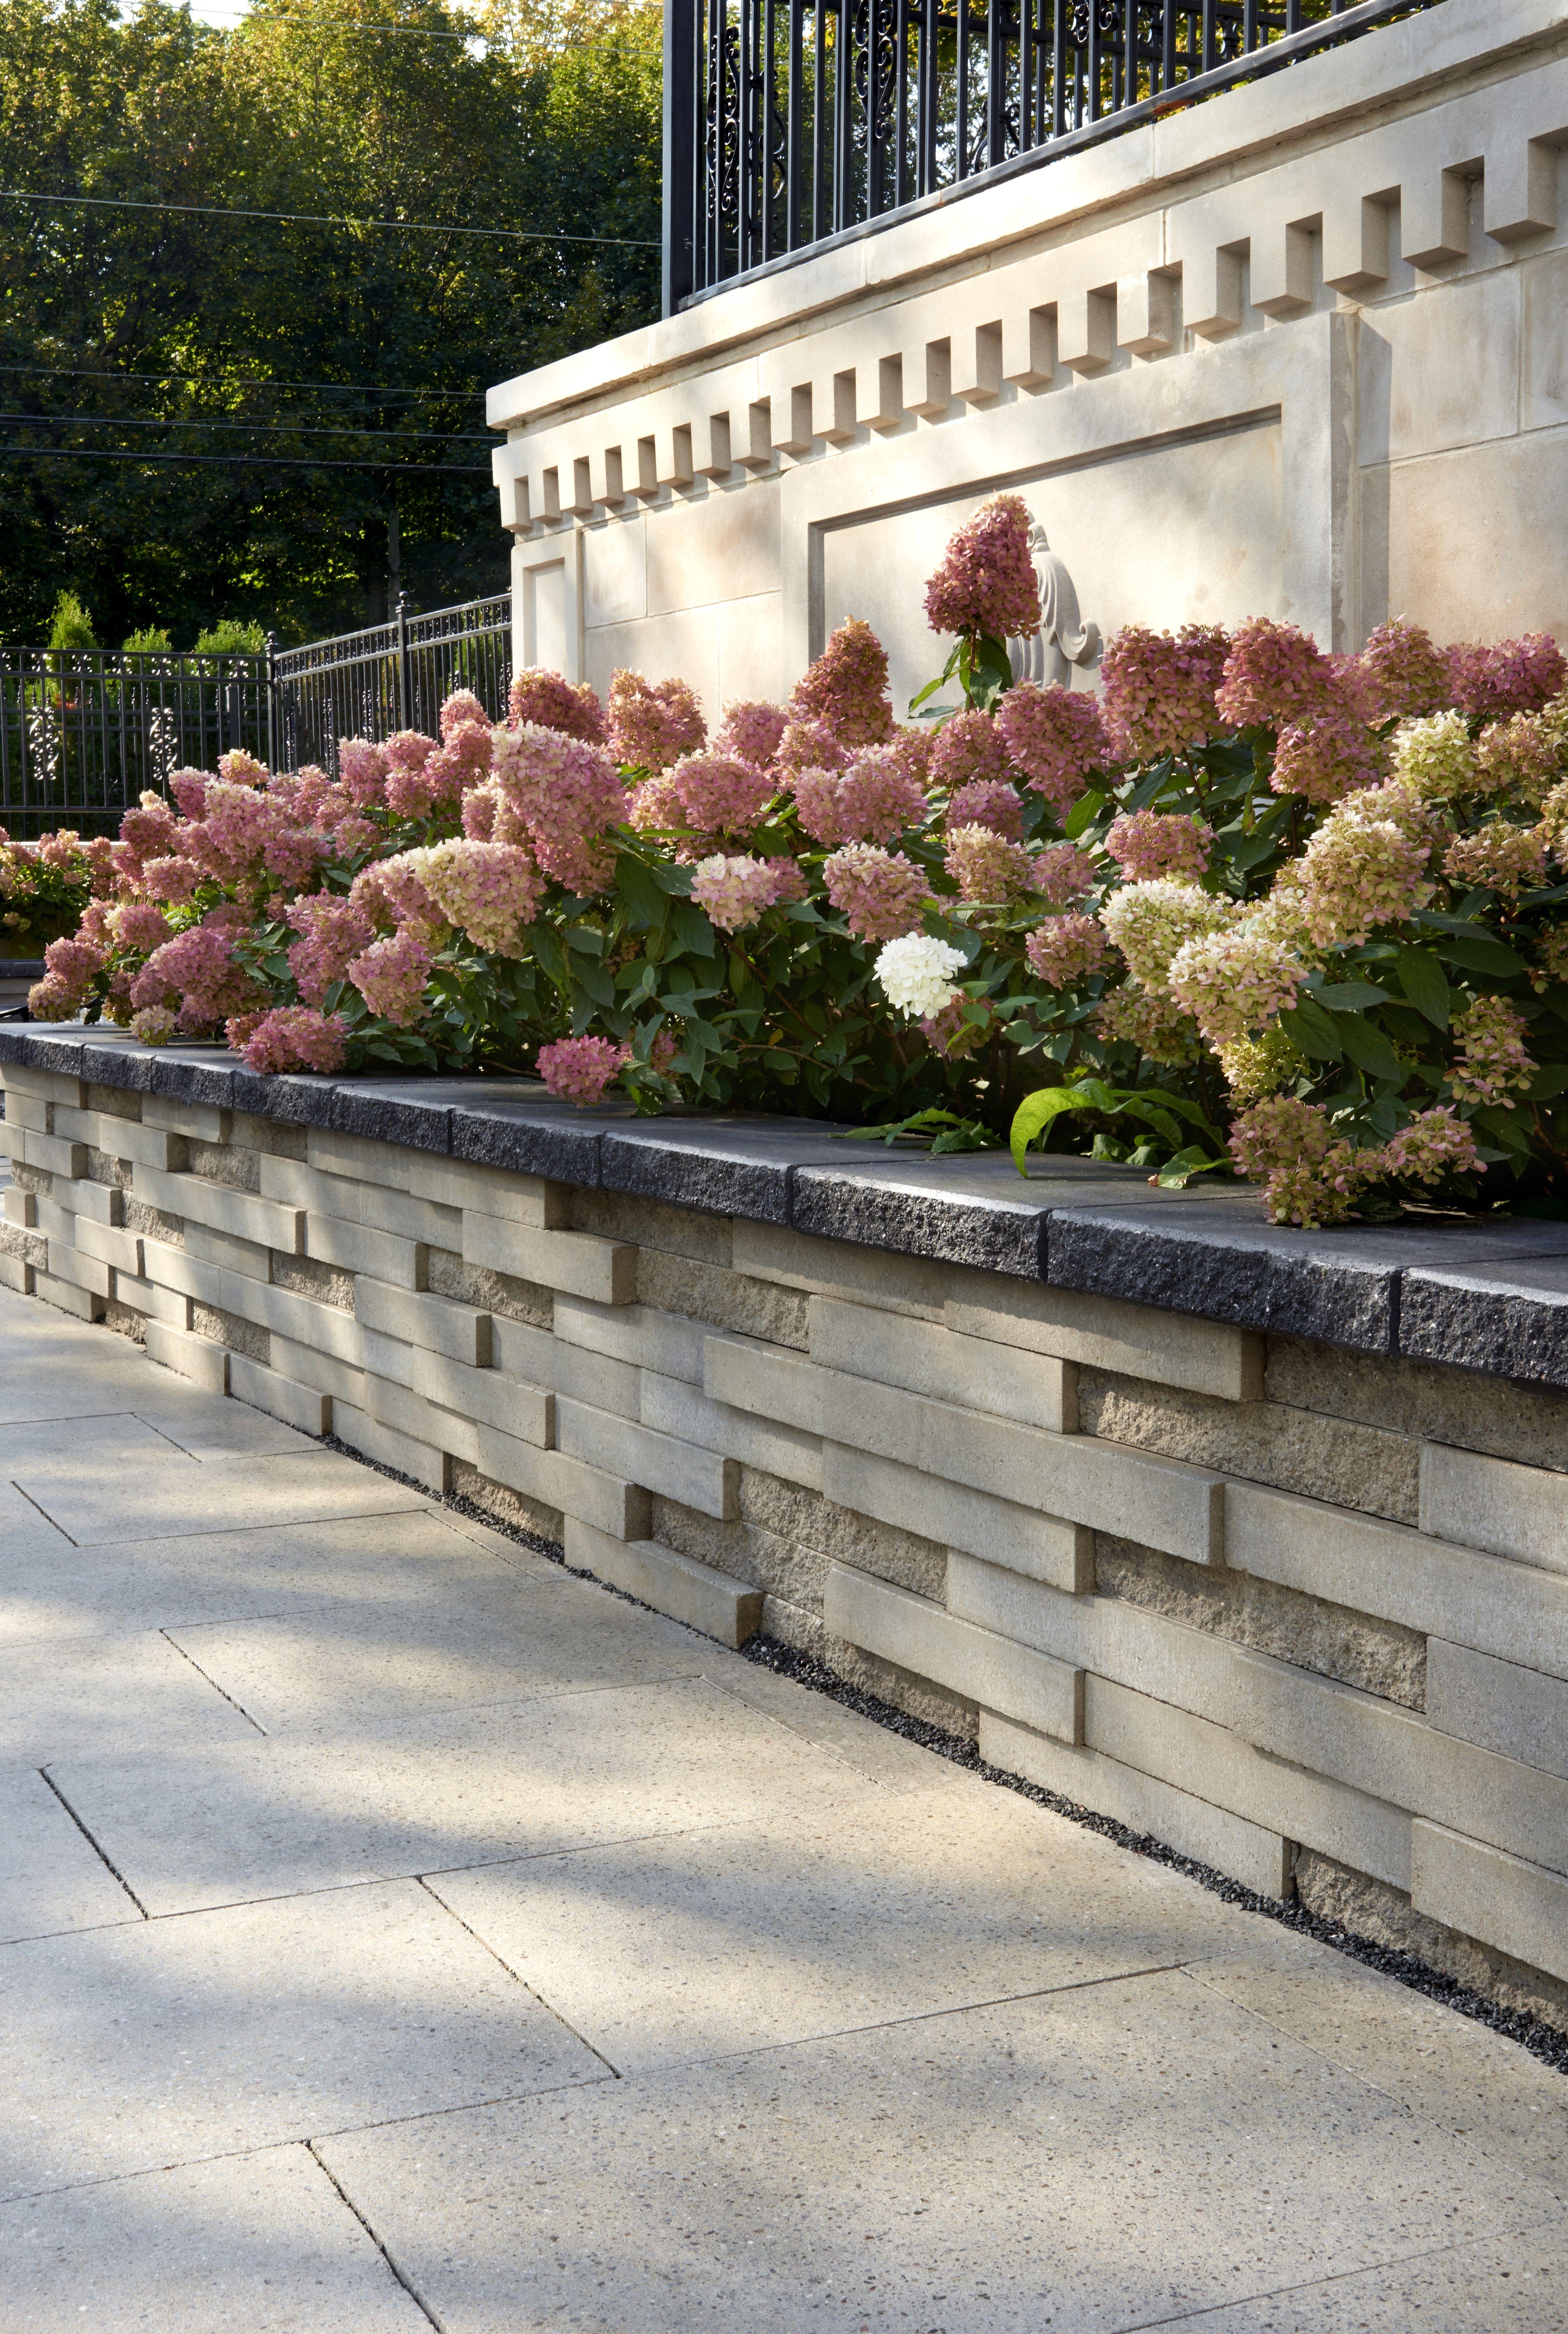 Retaining Wall Ideas Landscaping Retaining Walls Retaining Wall Design Backyard Retaining Walls Modern garden retaining wall ideas